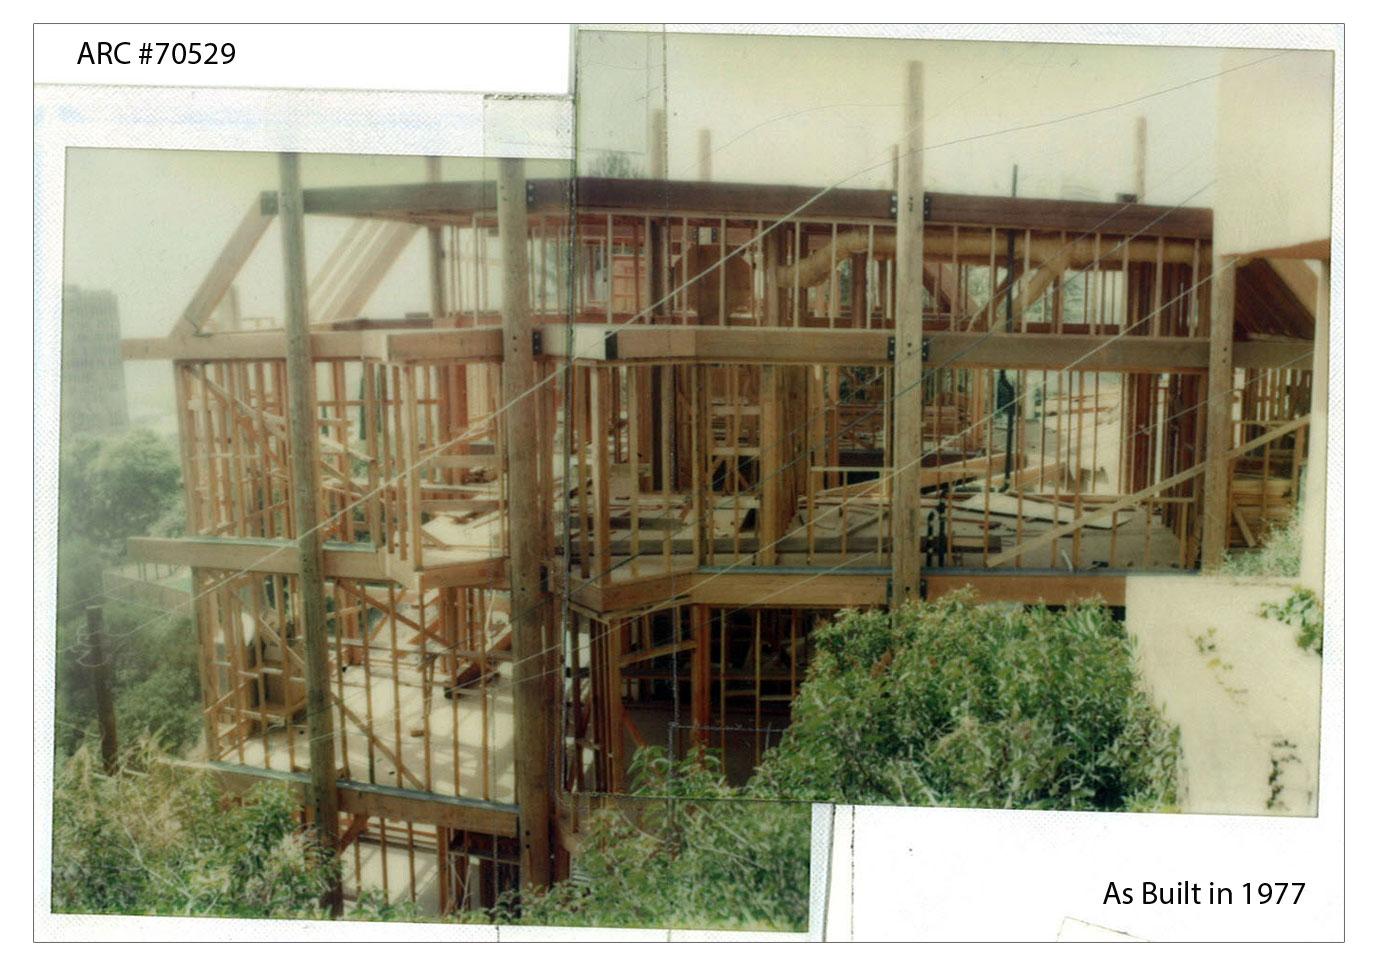 ARC-#70529_As built in 1977 (Framing)